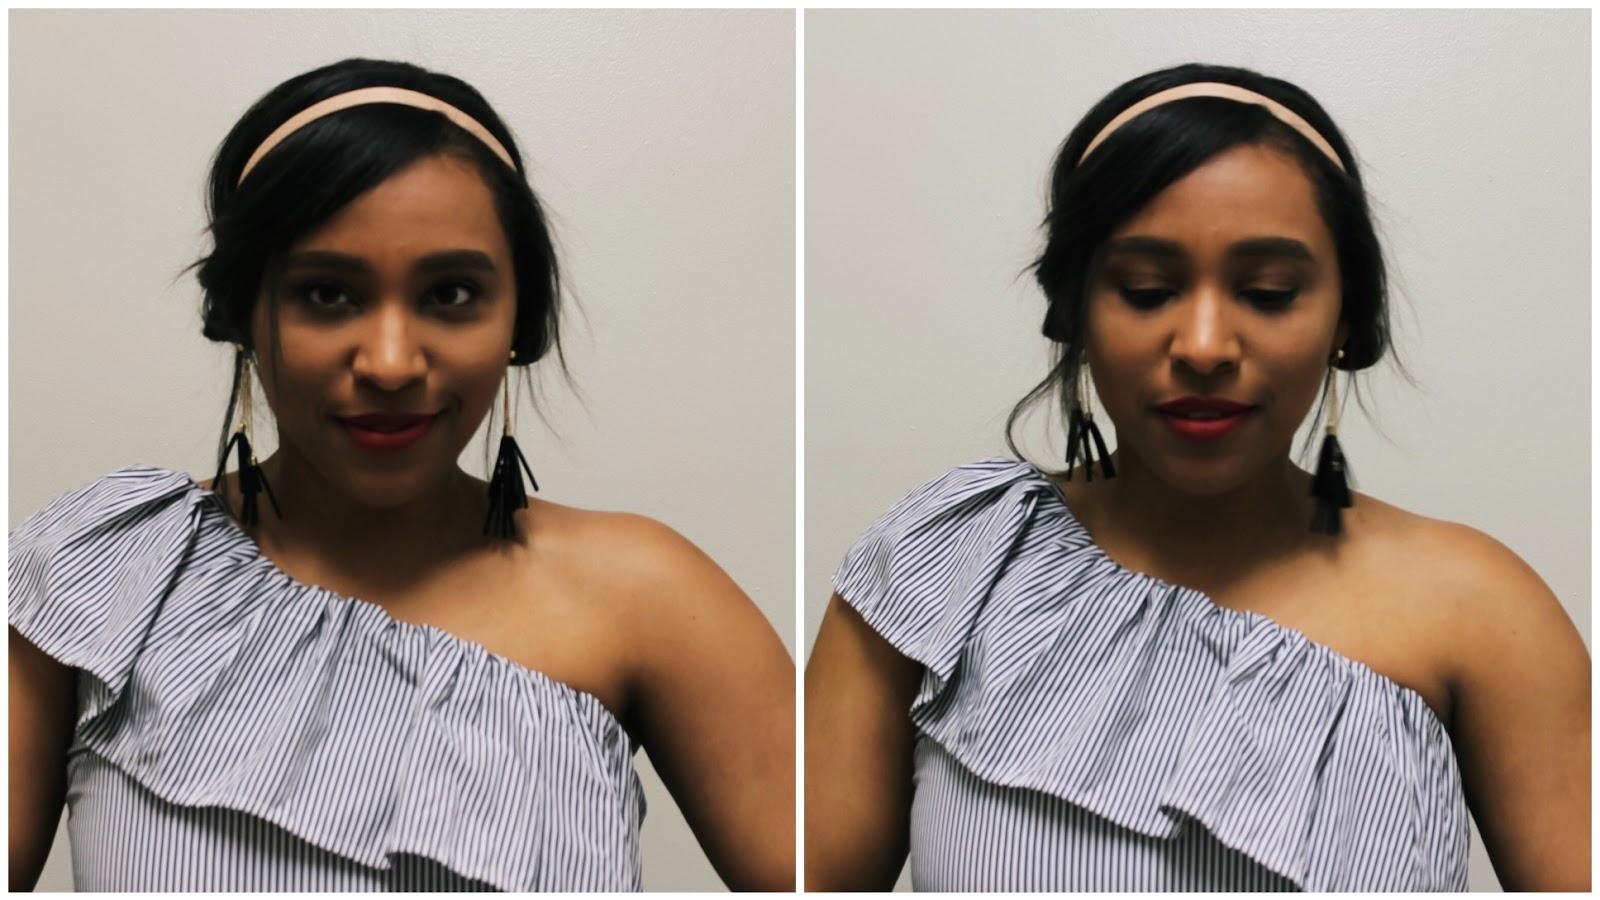 An Easy Updo Hairband Hairstyle, Fromm beauty, head band, boby pin, hair ties, ulta, cvs, hair products, short hair styles, headband hair styles, hair styles for short hair, bob hair cut, hair tutorial